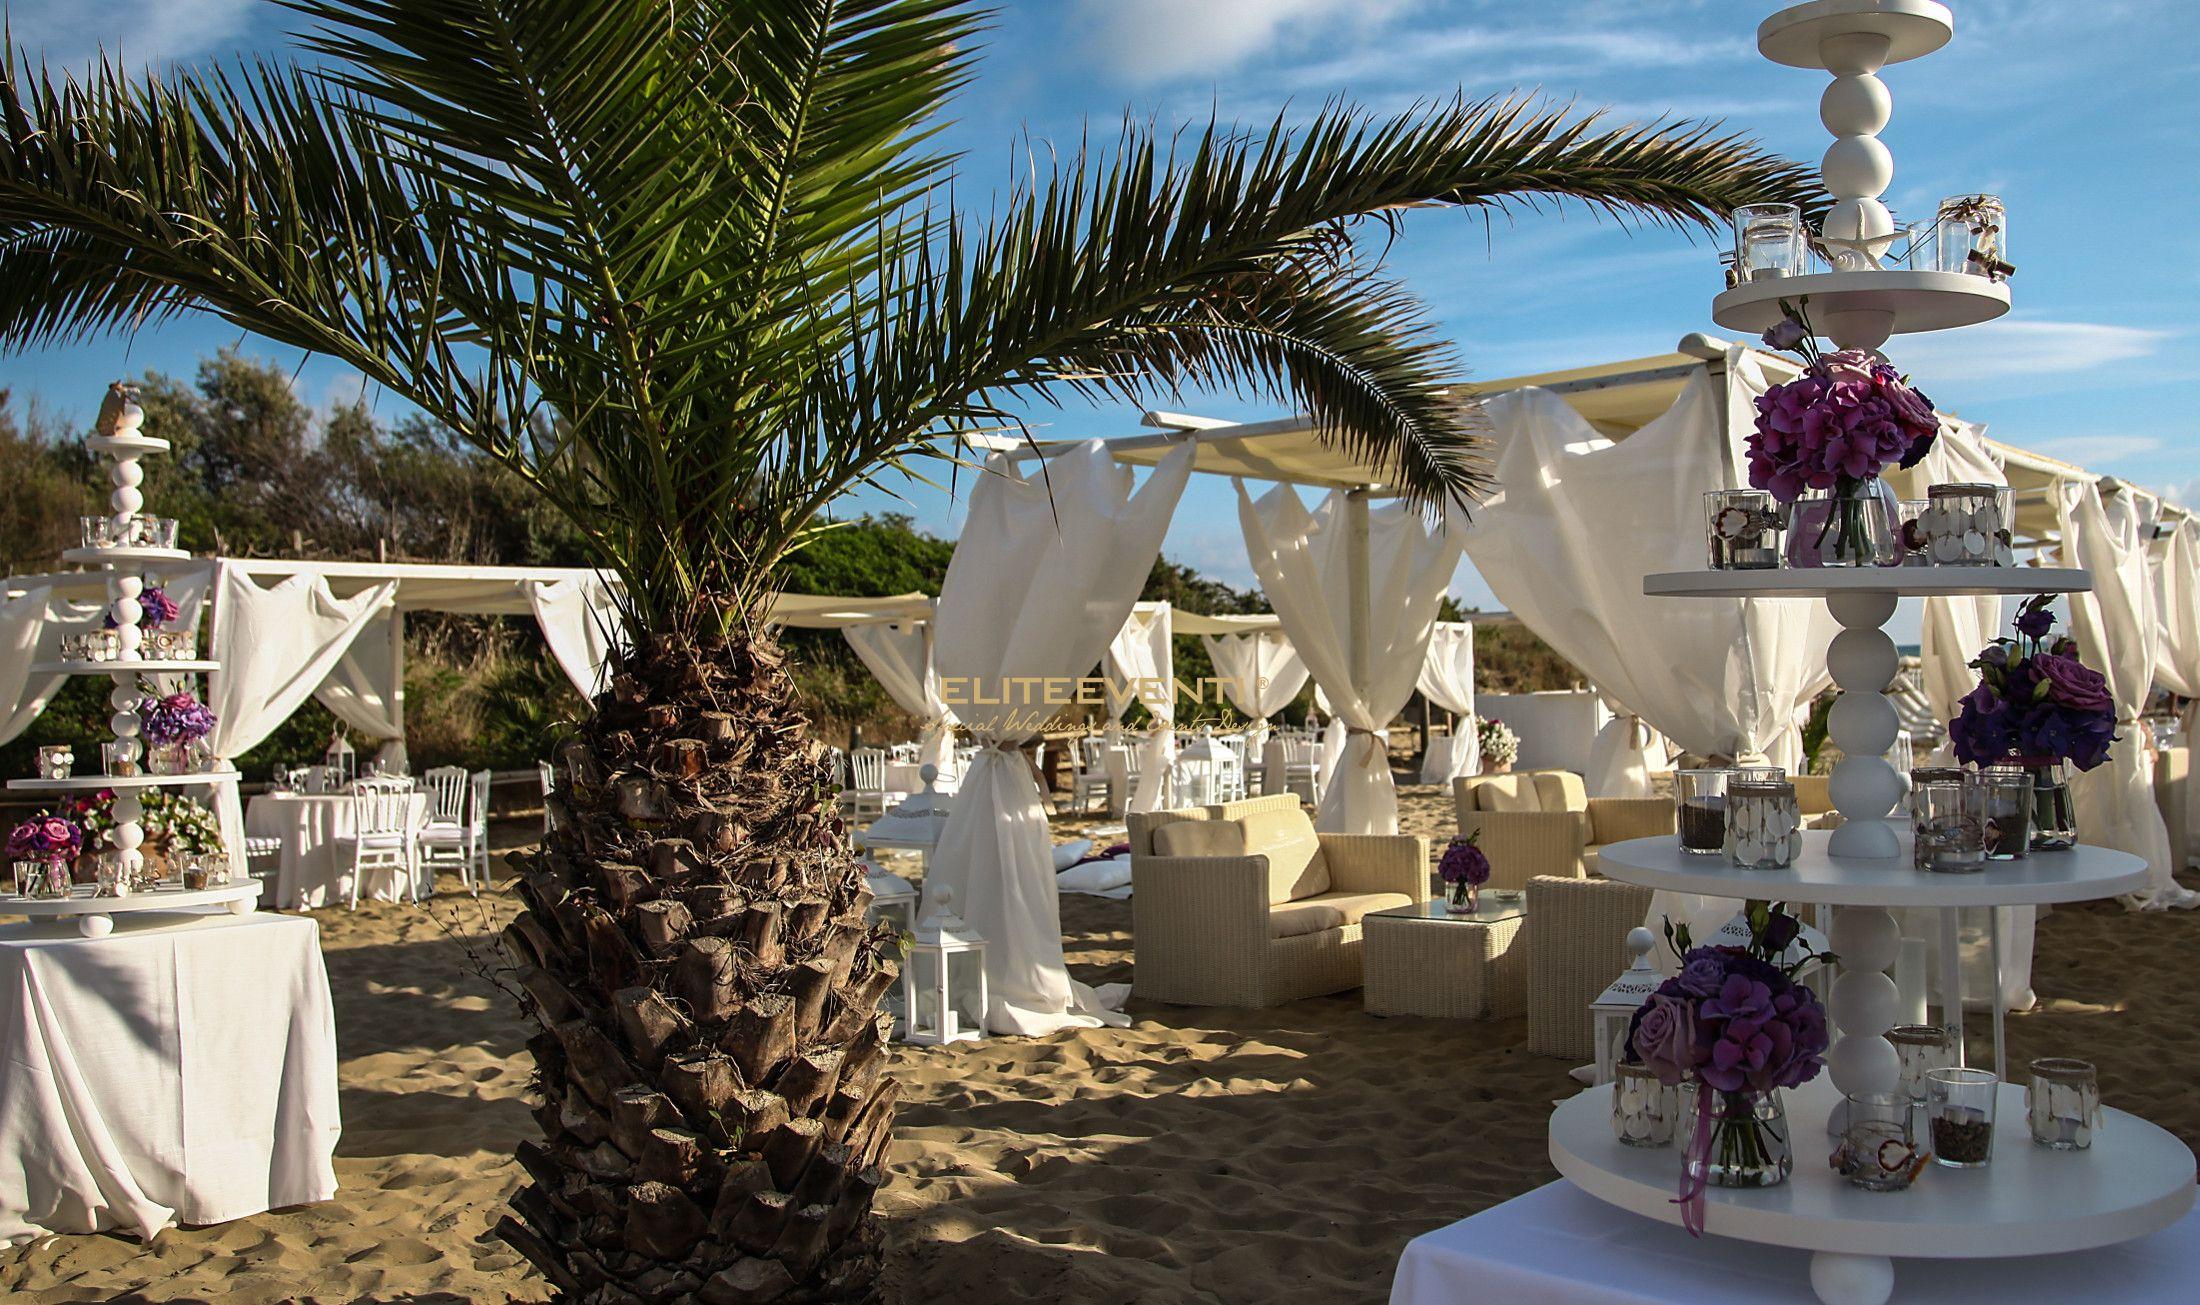 Arredi_e_decori_beach_wedding_eliteeventi